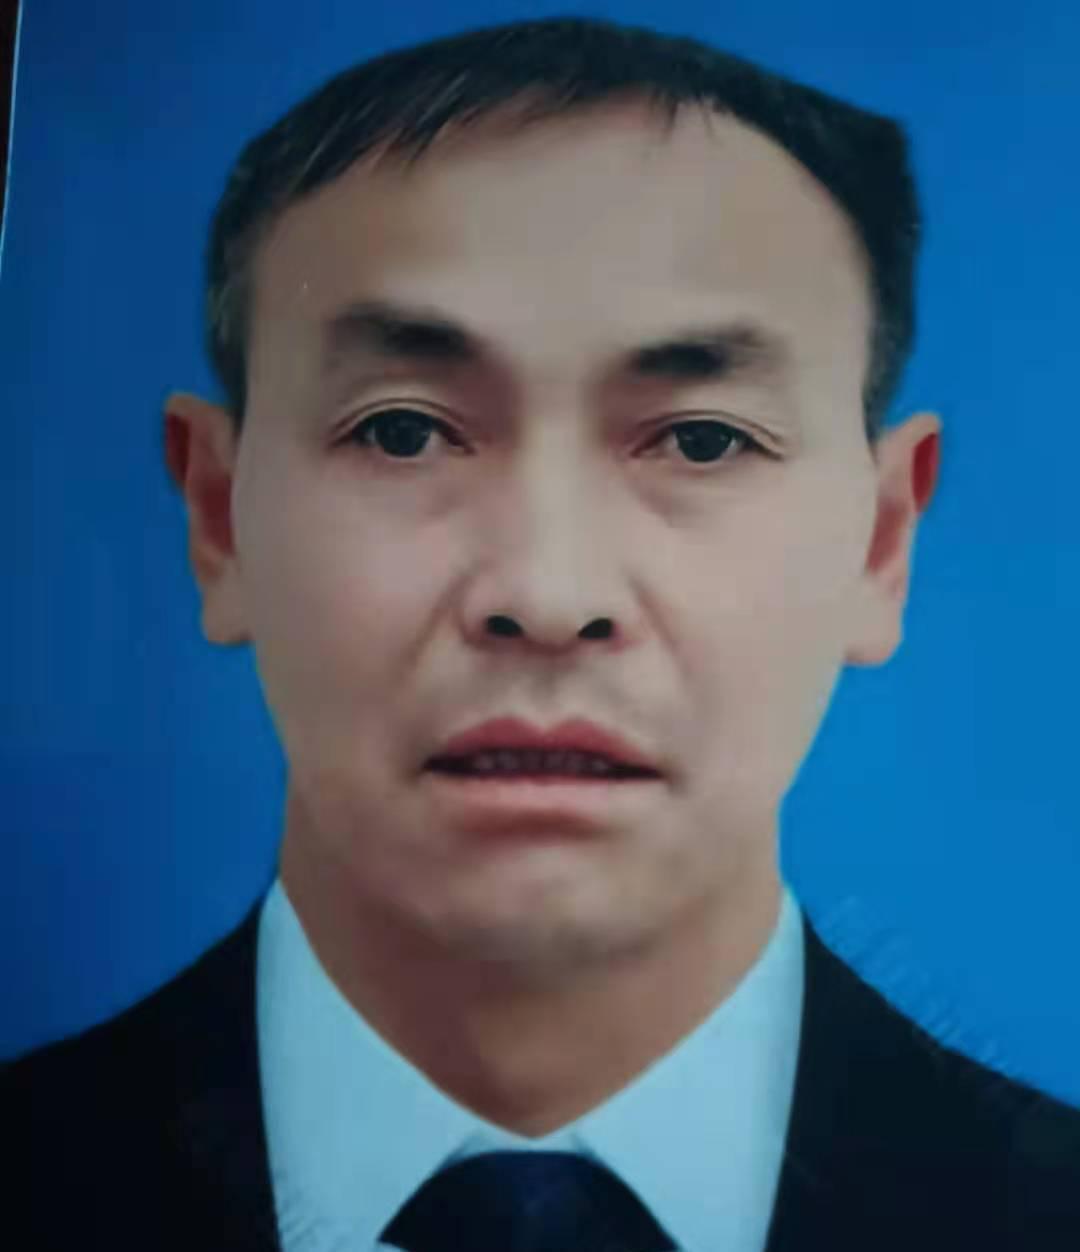 中国人寿方廷权